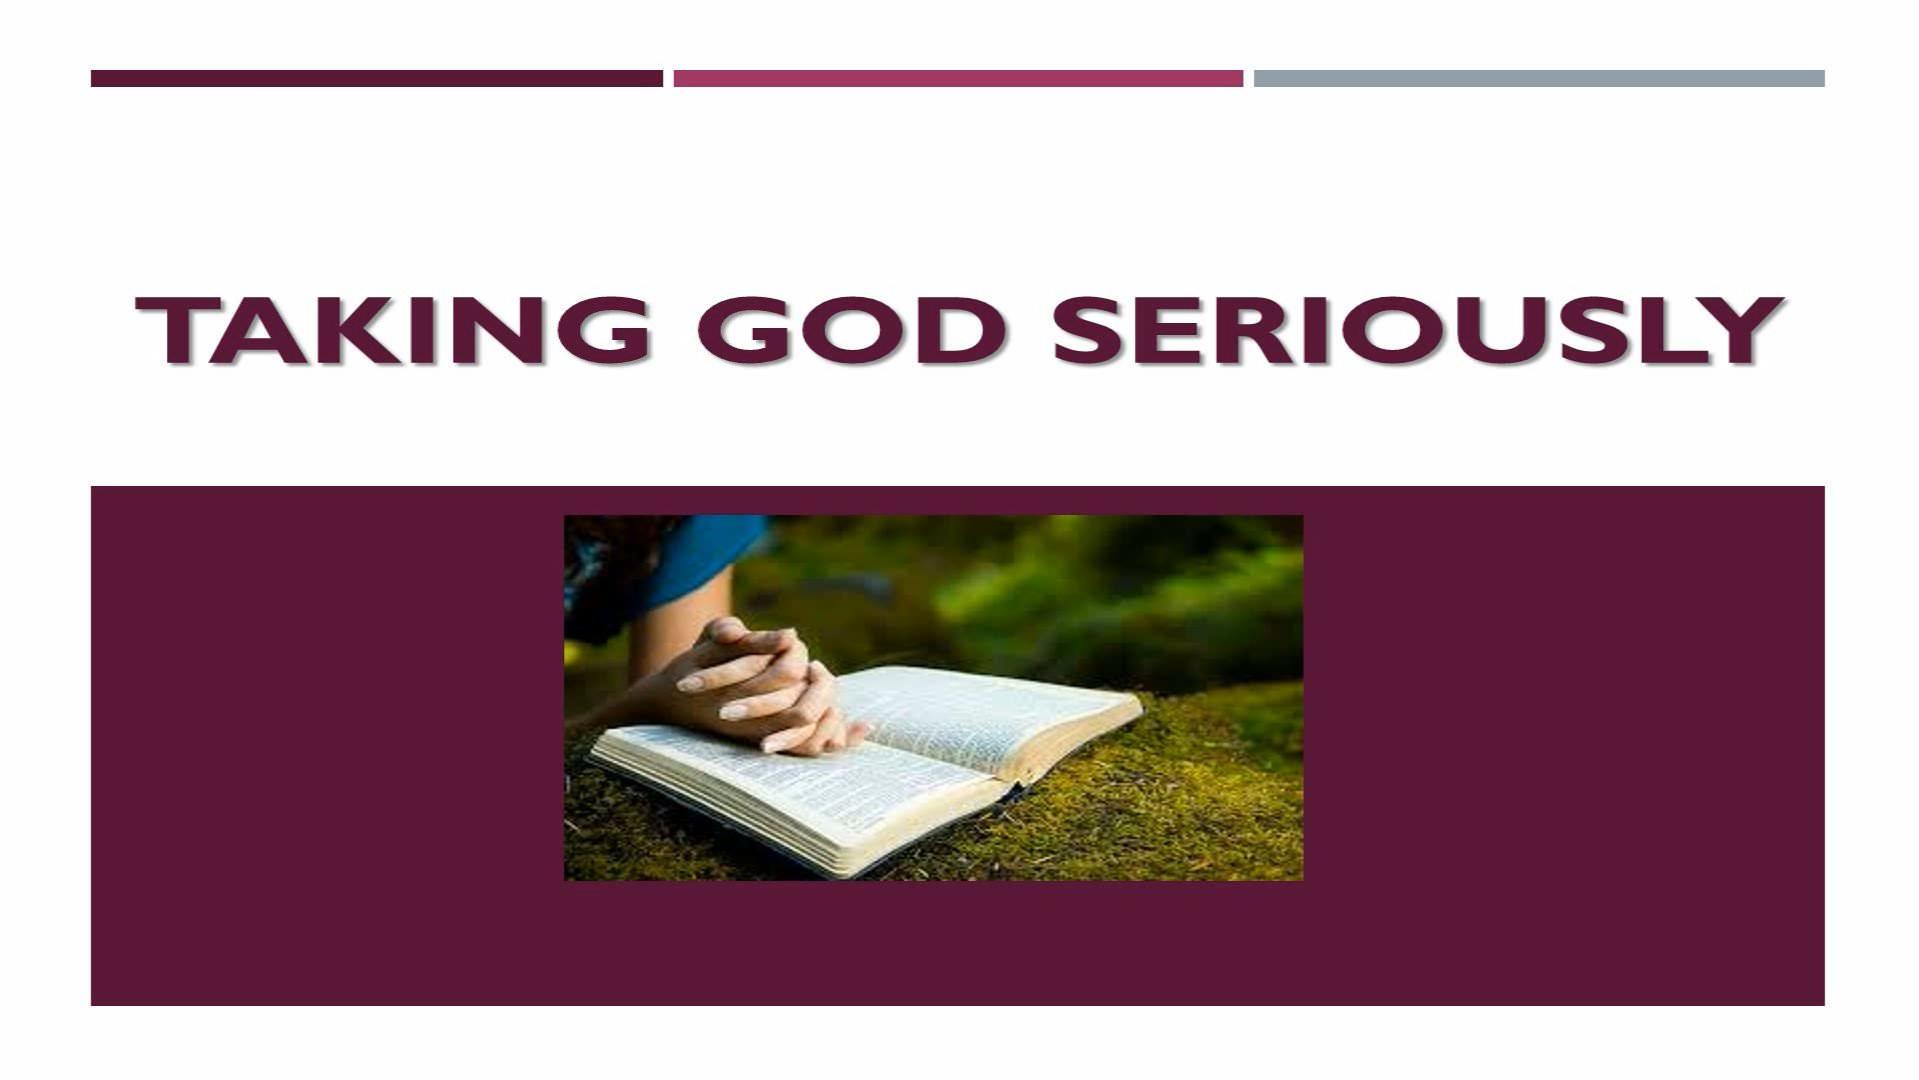 Taking God Seriously